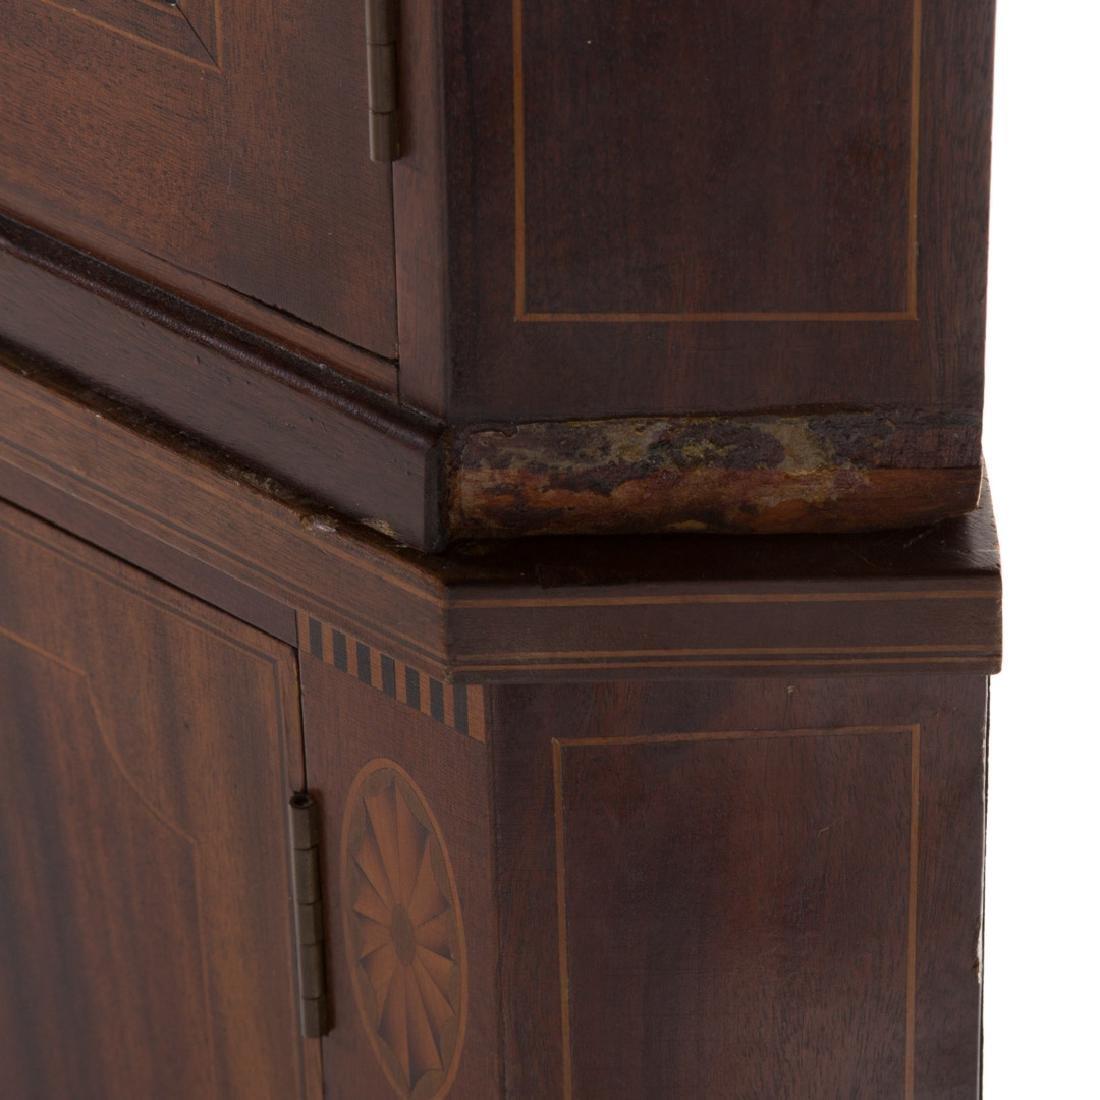 Potthast Federal style mahogany corner cabinet - 5